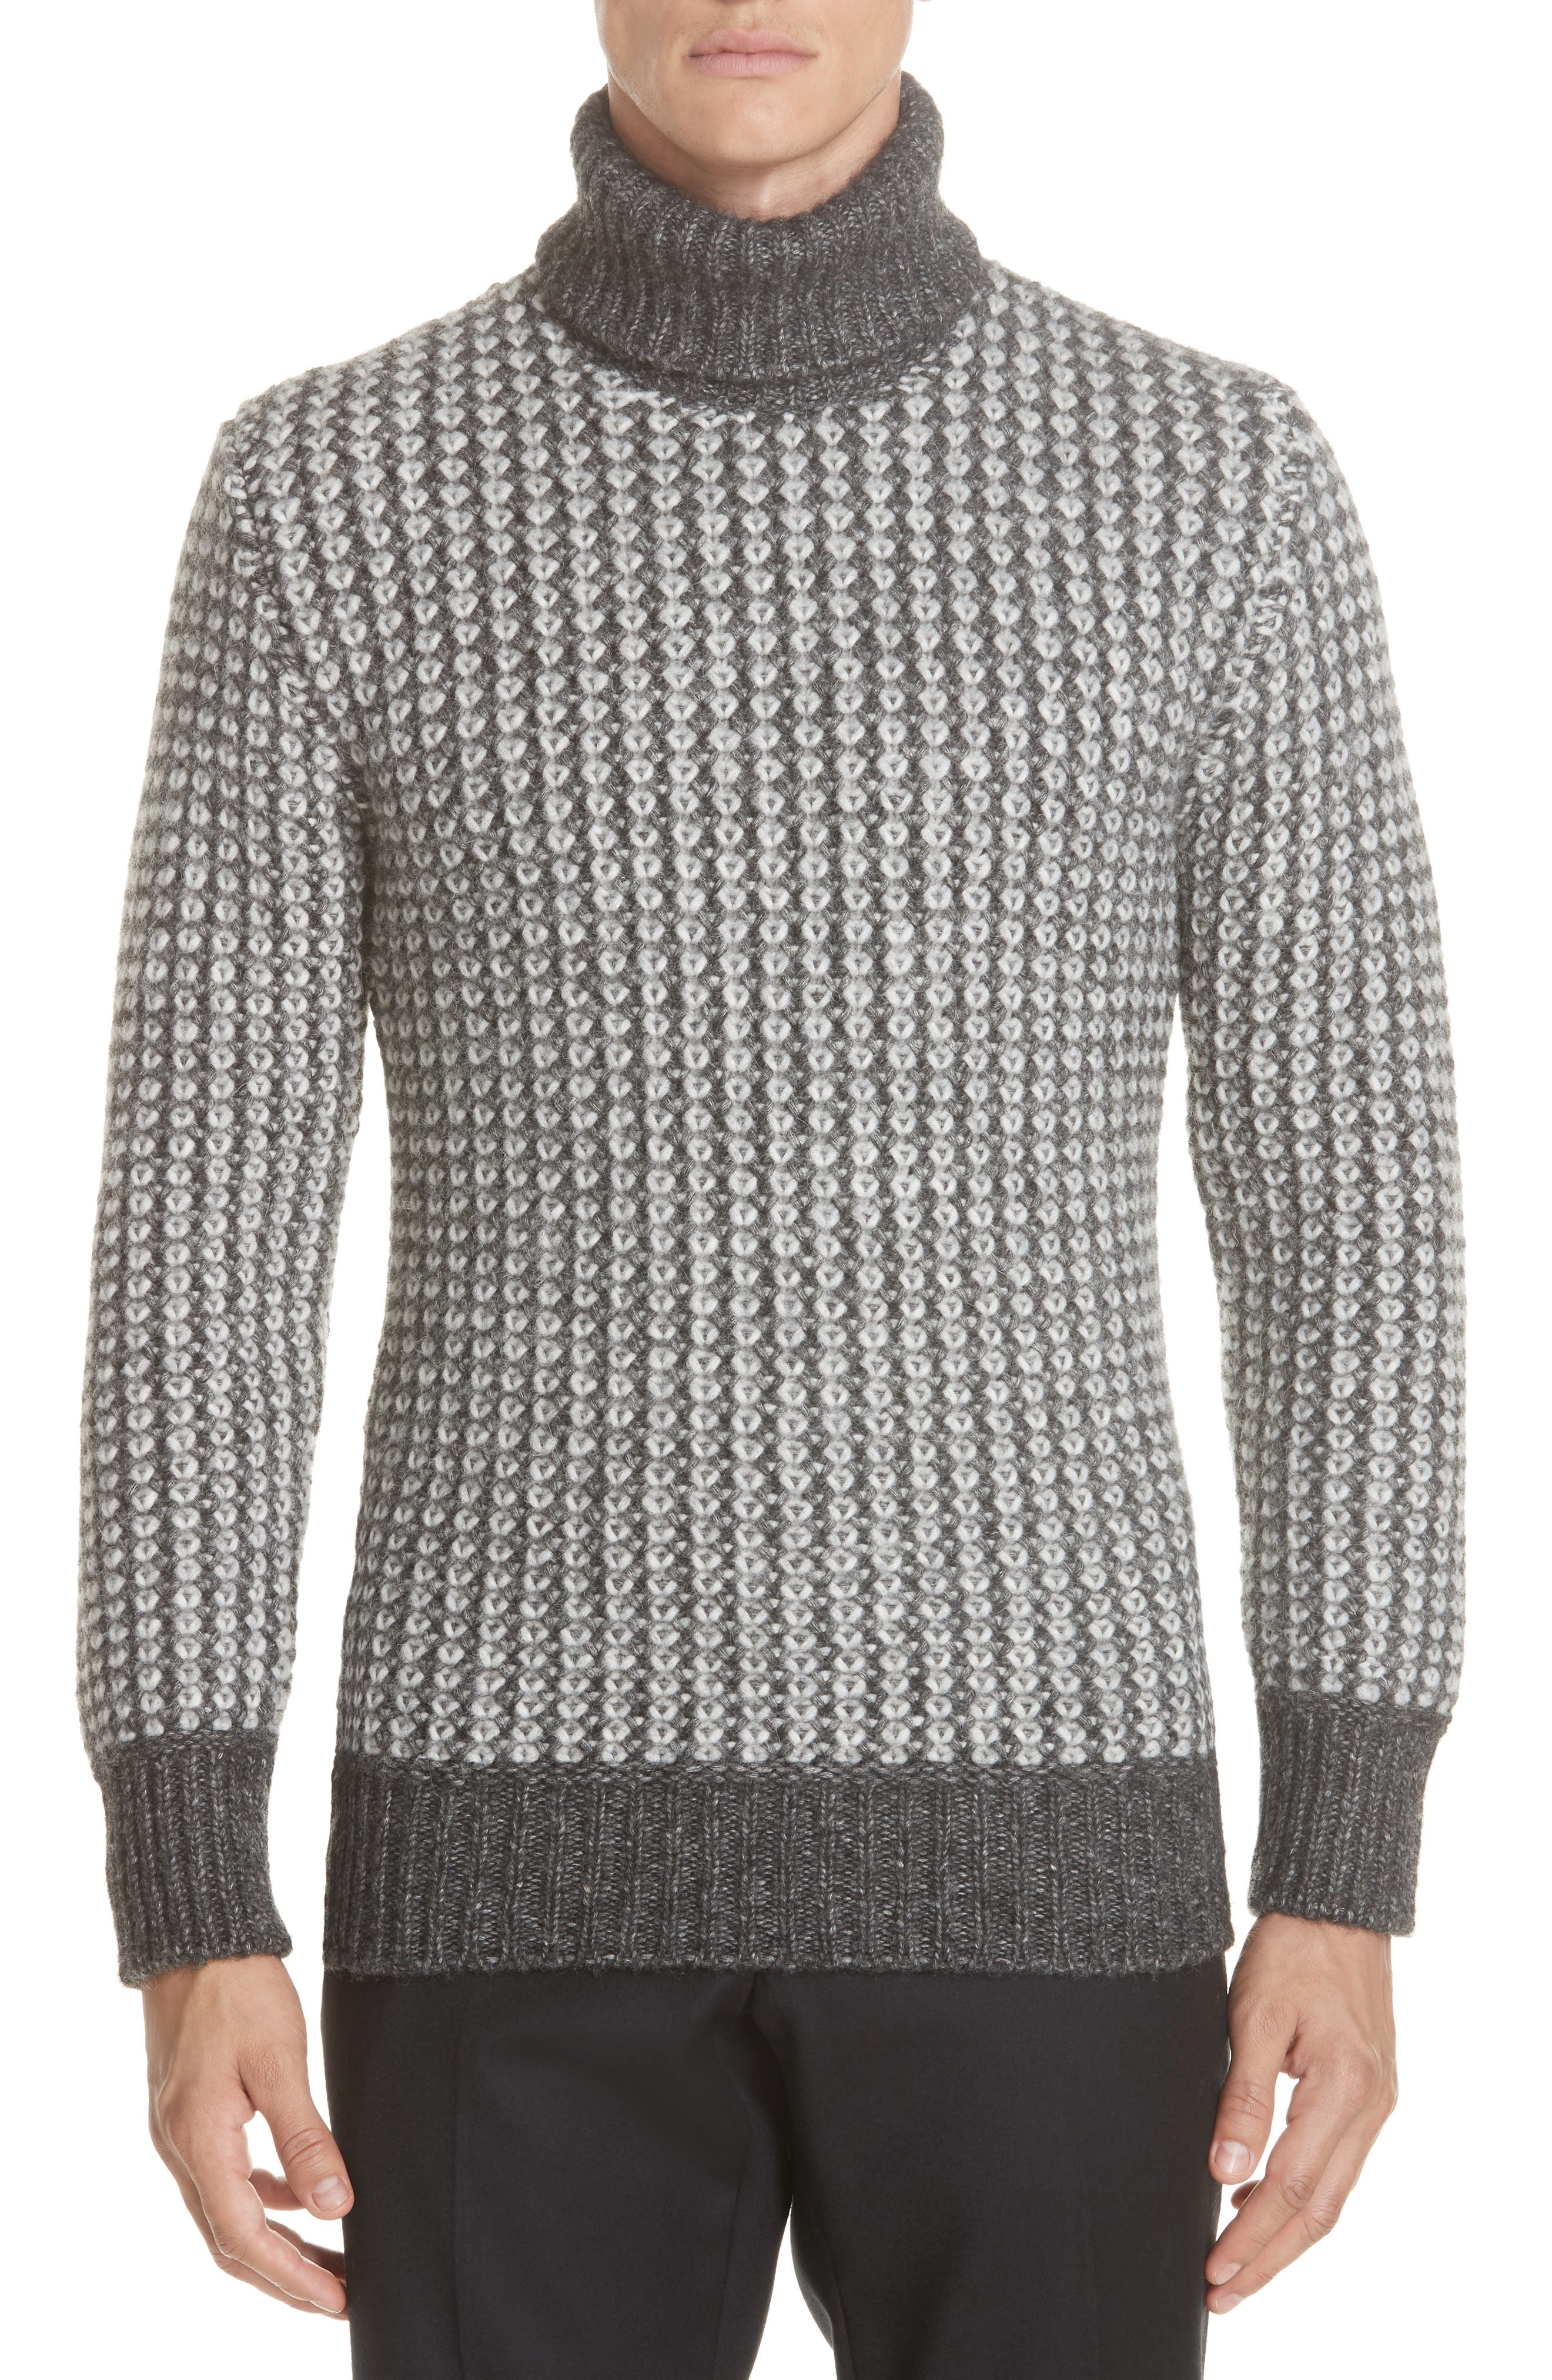 Cotton Blend Turtleneck Sweater,                             Main thumbnail 1, color,                             GREY